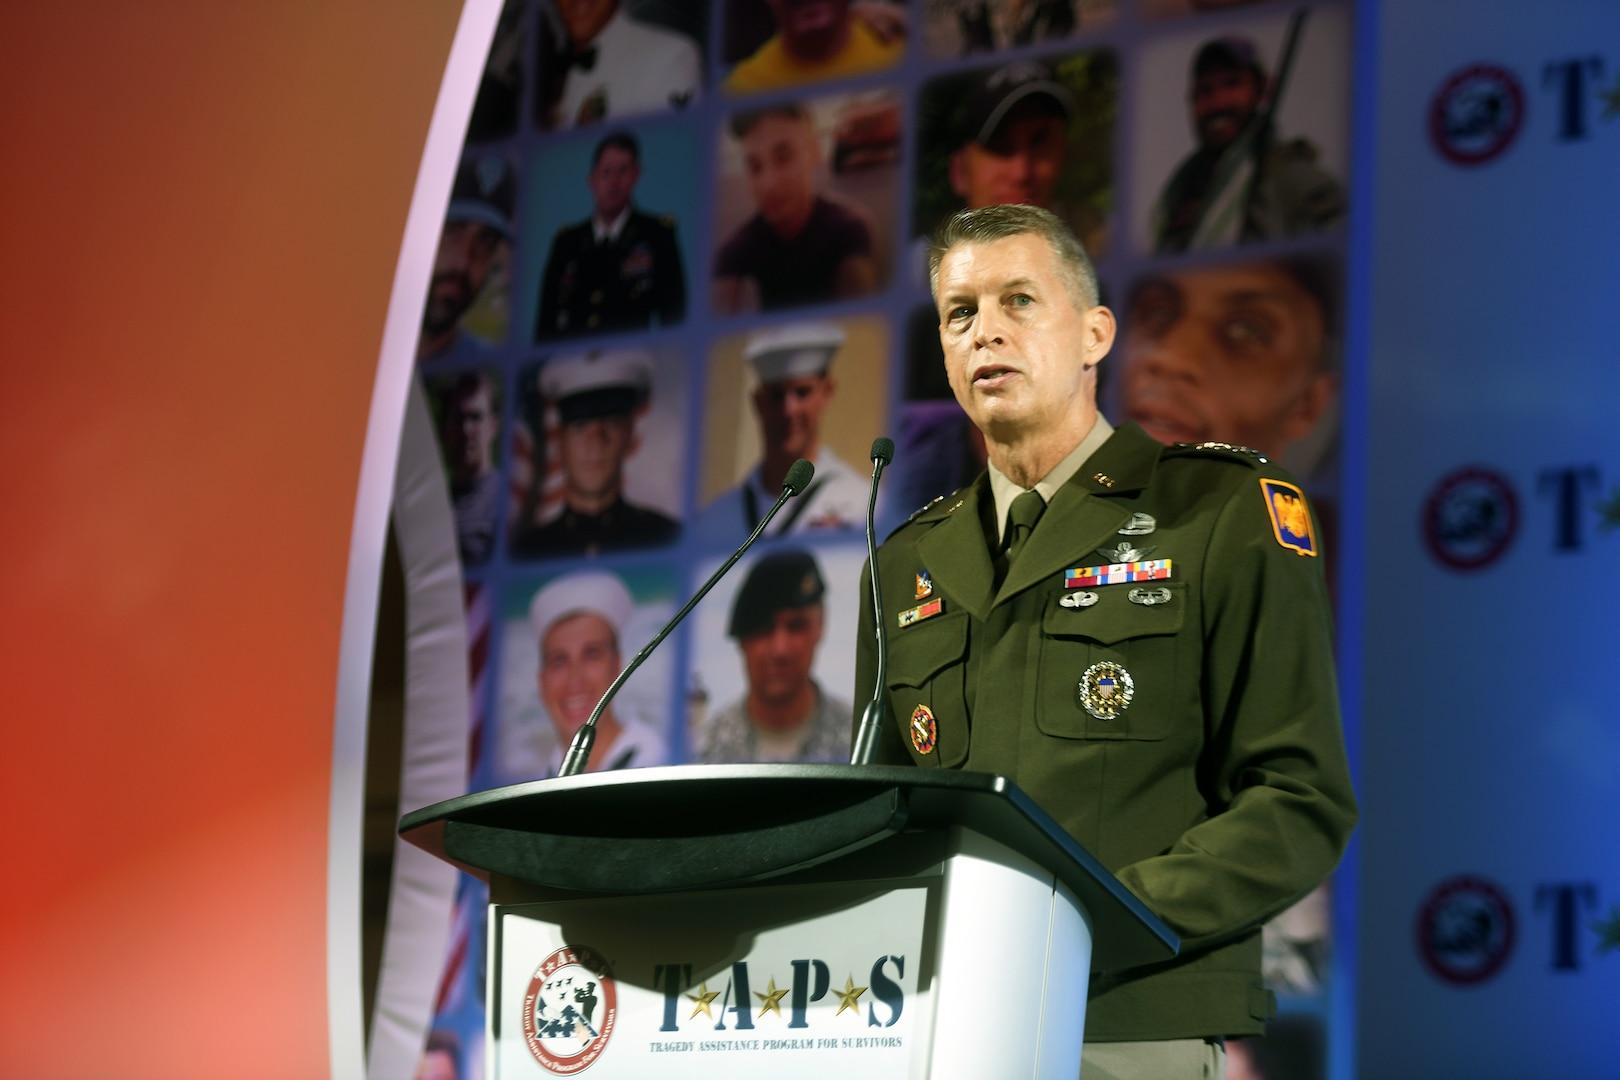 Army Gen. Daniel Hokanson, chief, National Guard Bureau, addresses attendees at the TAPS 27th Annual National Military Survivor Seminar and Good Grief Camp, Arlington, Virginia, May 28, 2021.